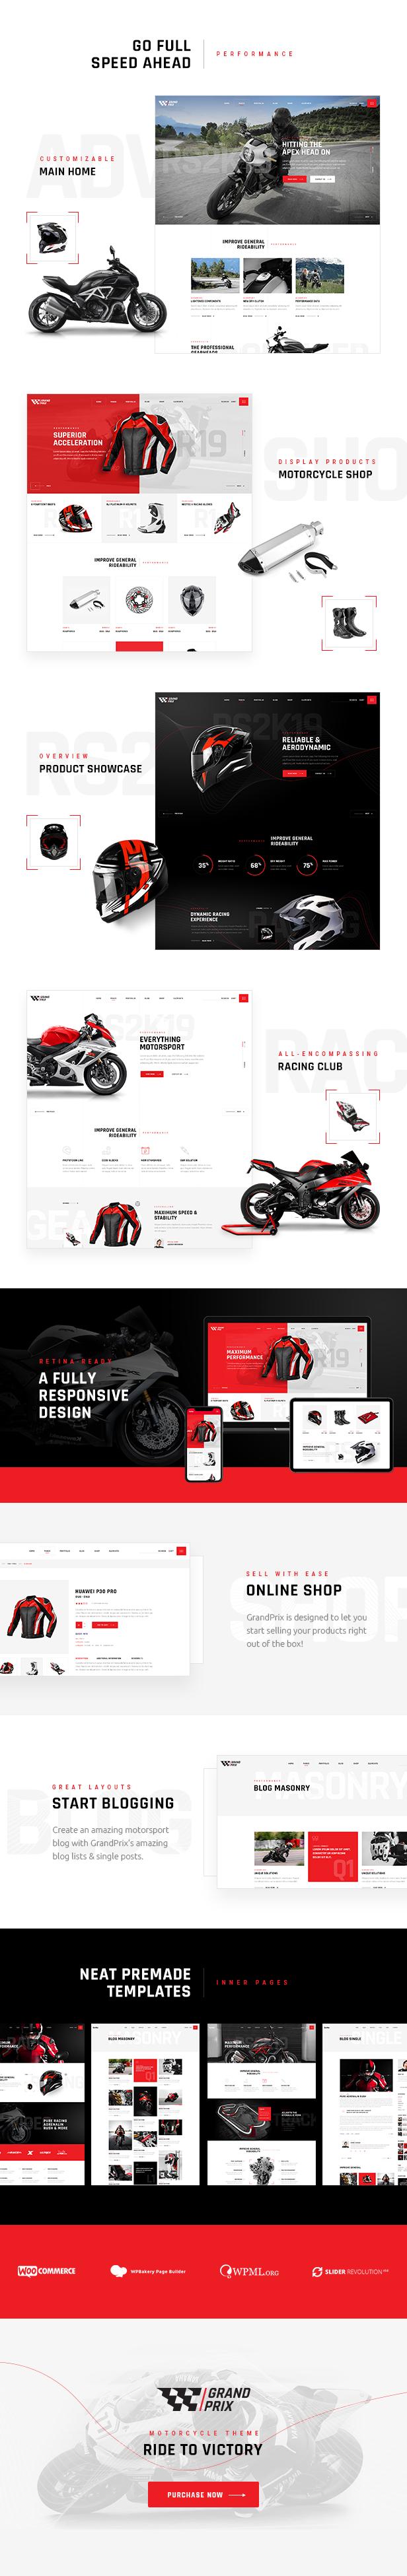 GrandPrix - Motorrad WordPress Theme - 1